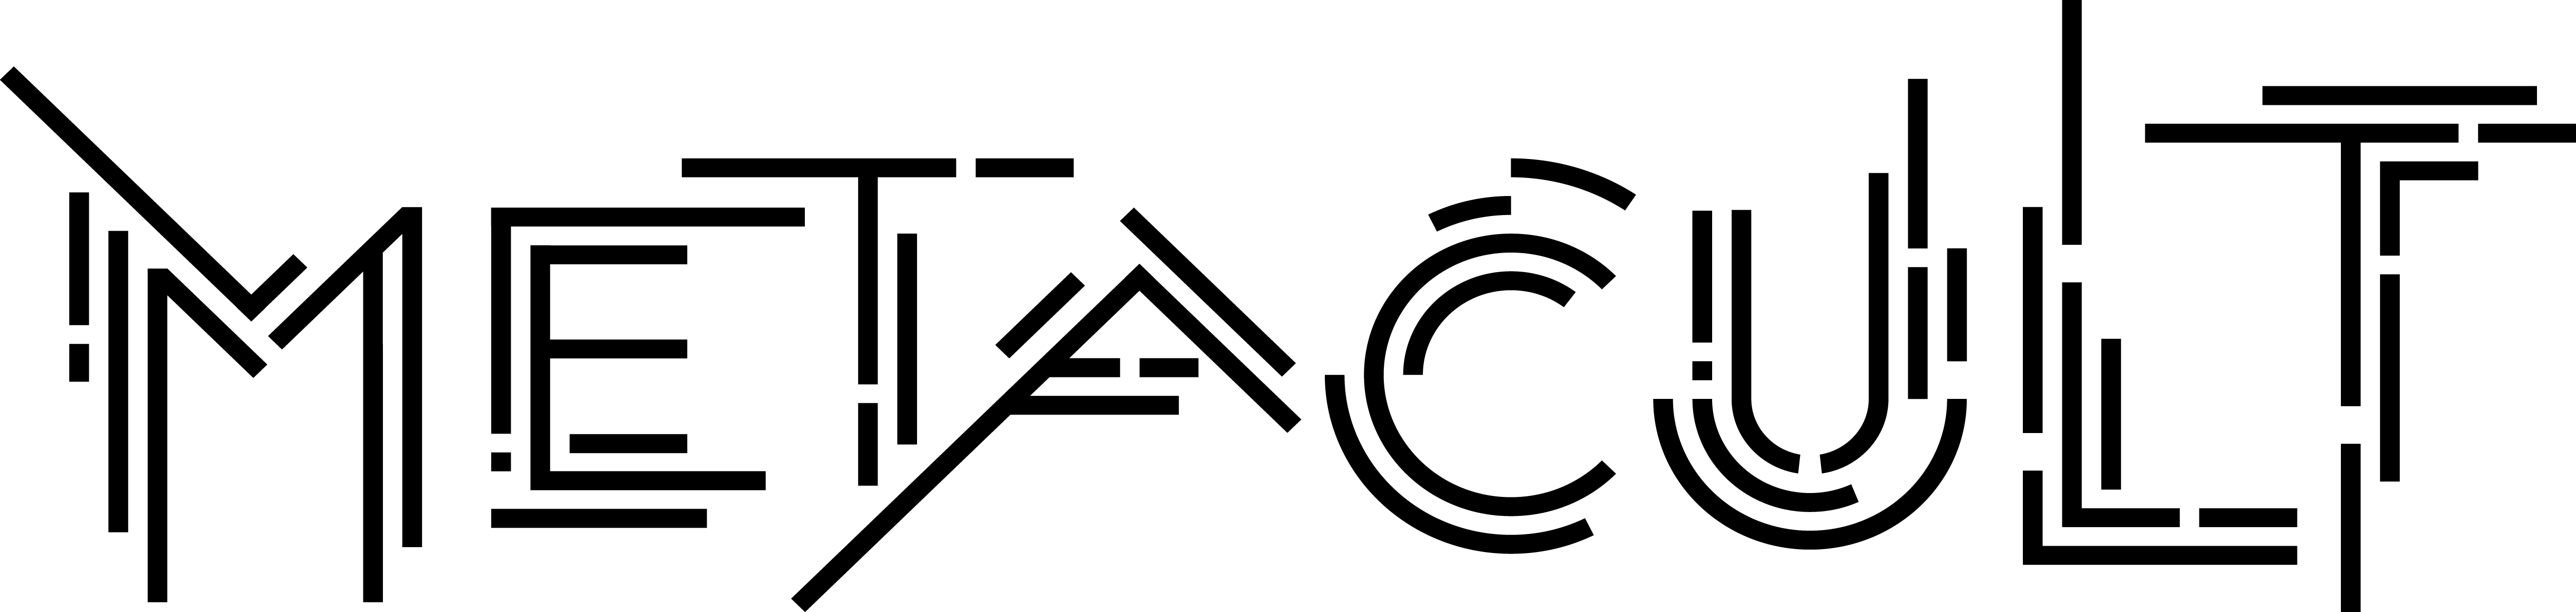 Metacult Logo